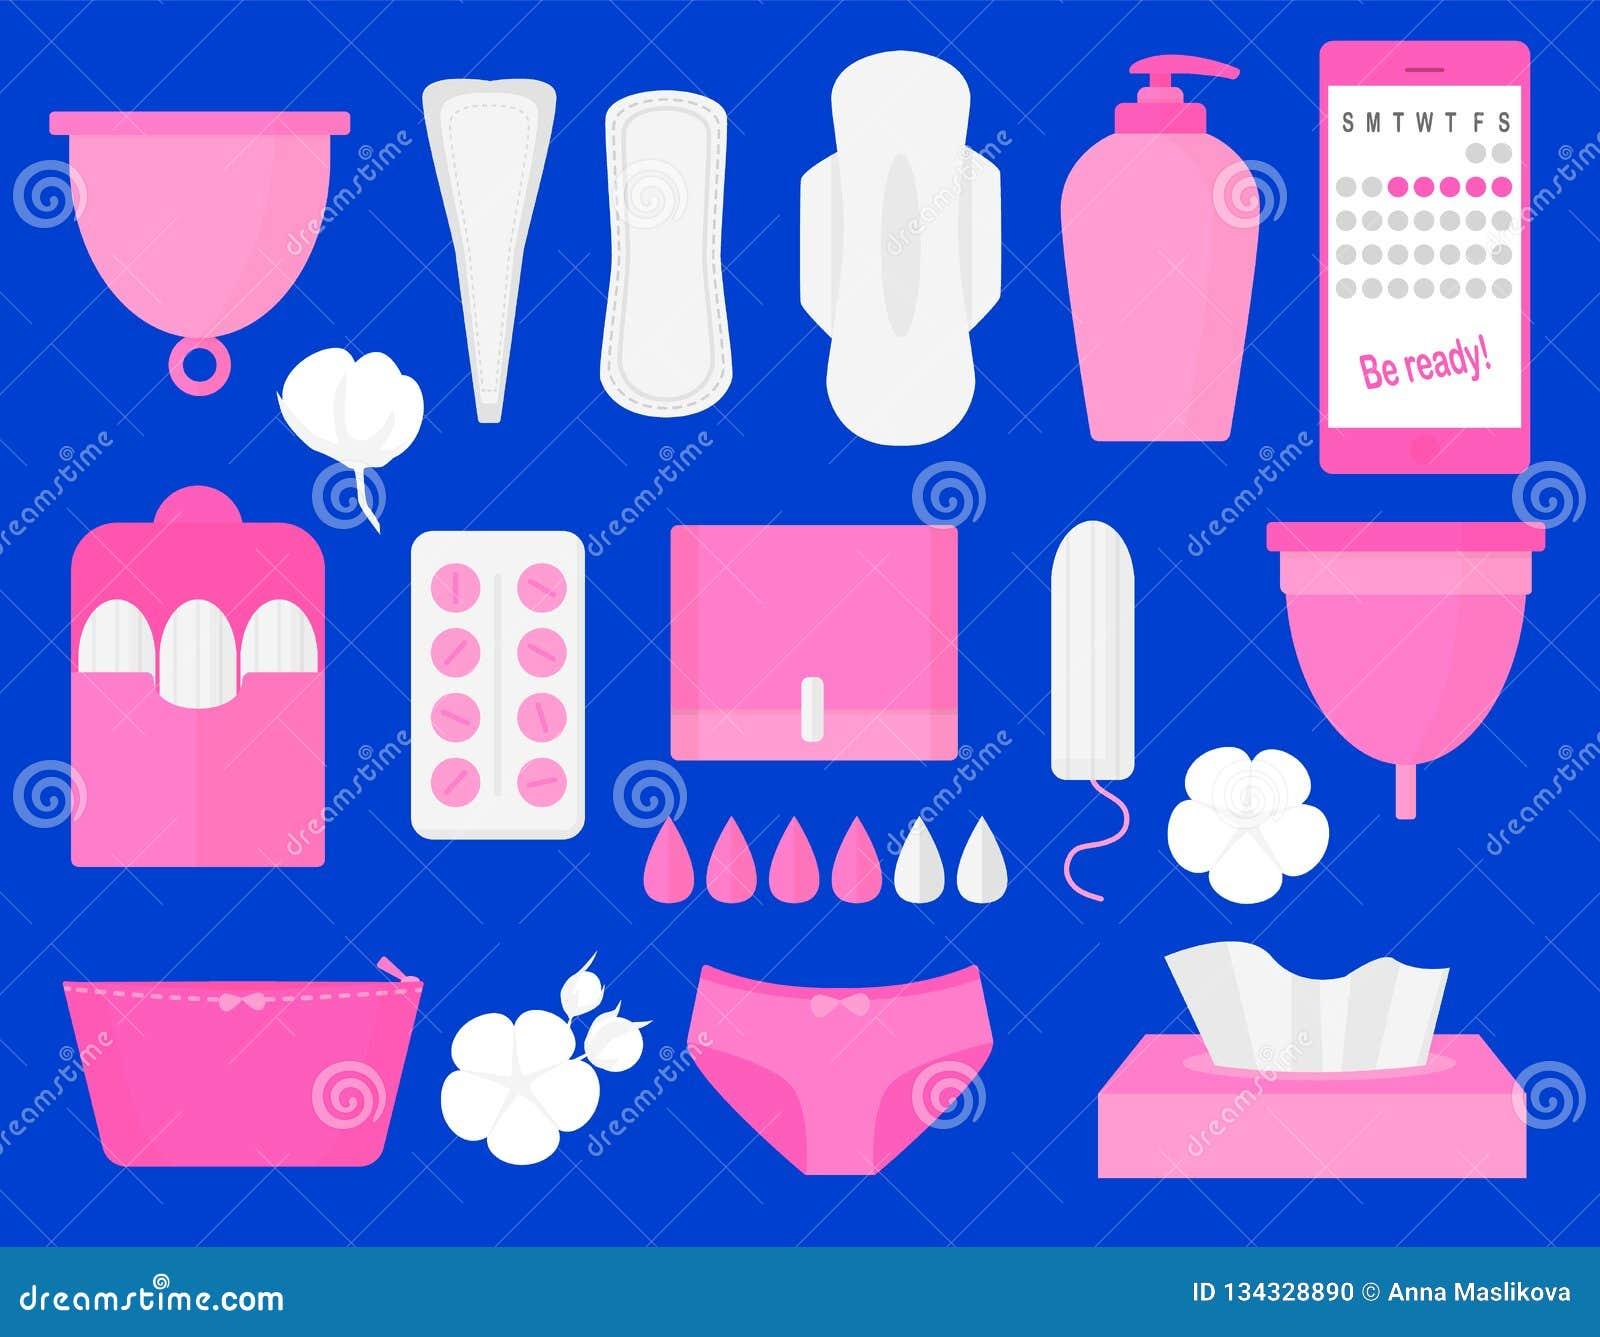 Woman hygiene products - tampon, menstrual cup, sanitary, pills. Vector flat big illustration set